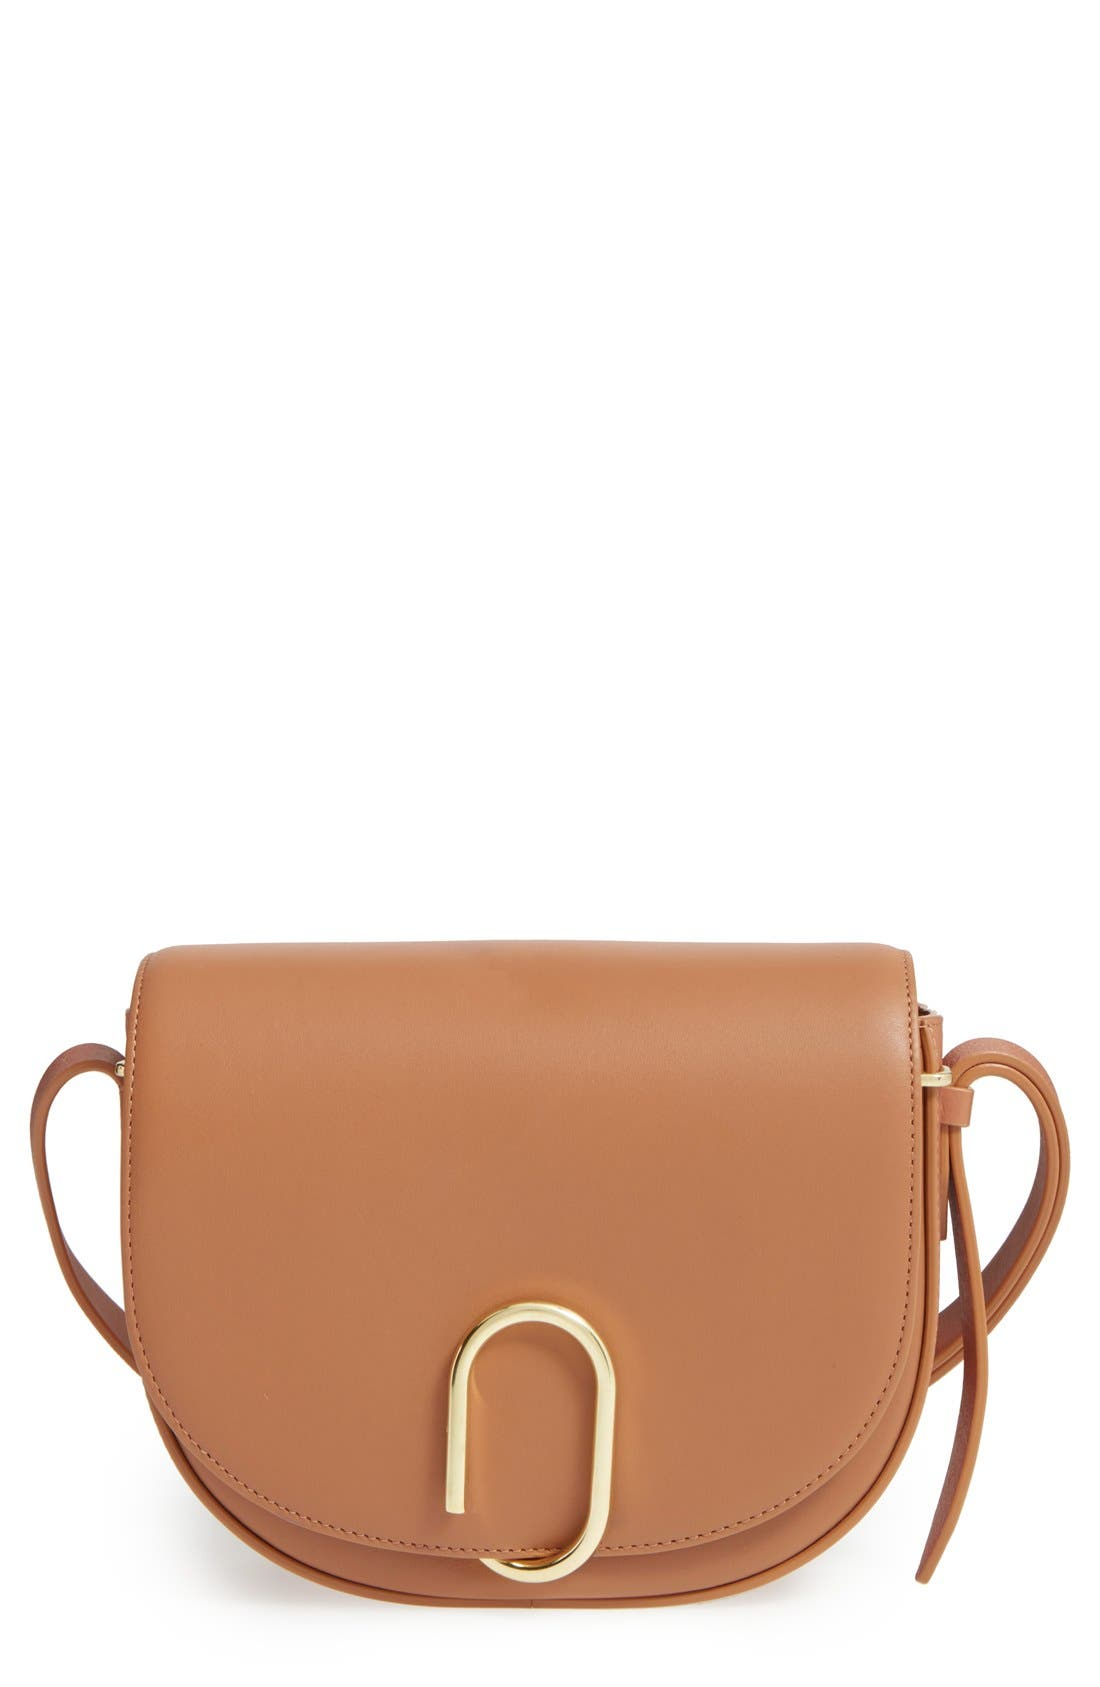 Alix Leather Saddle Bag,                         Main,                         color, Camel